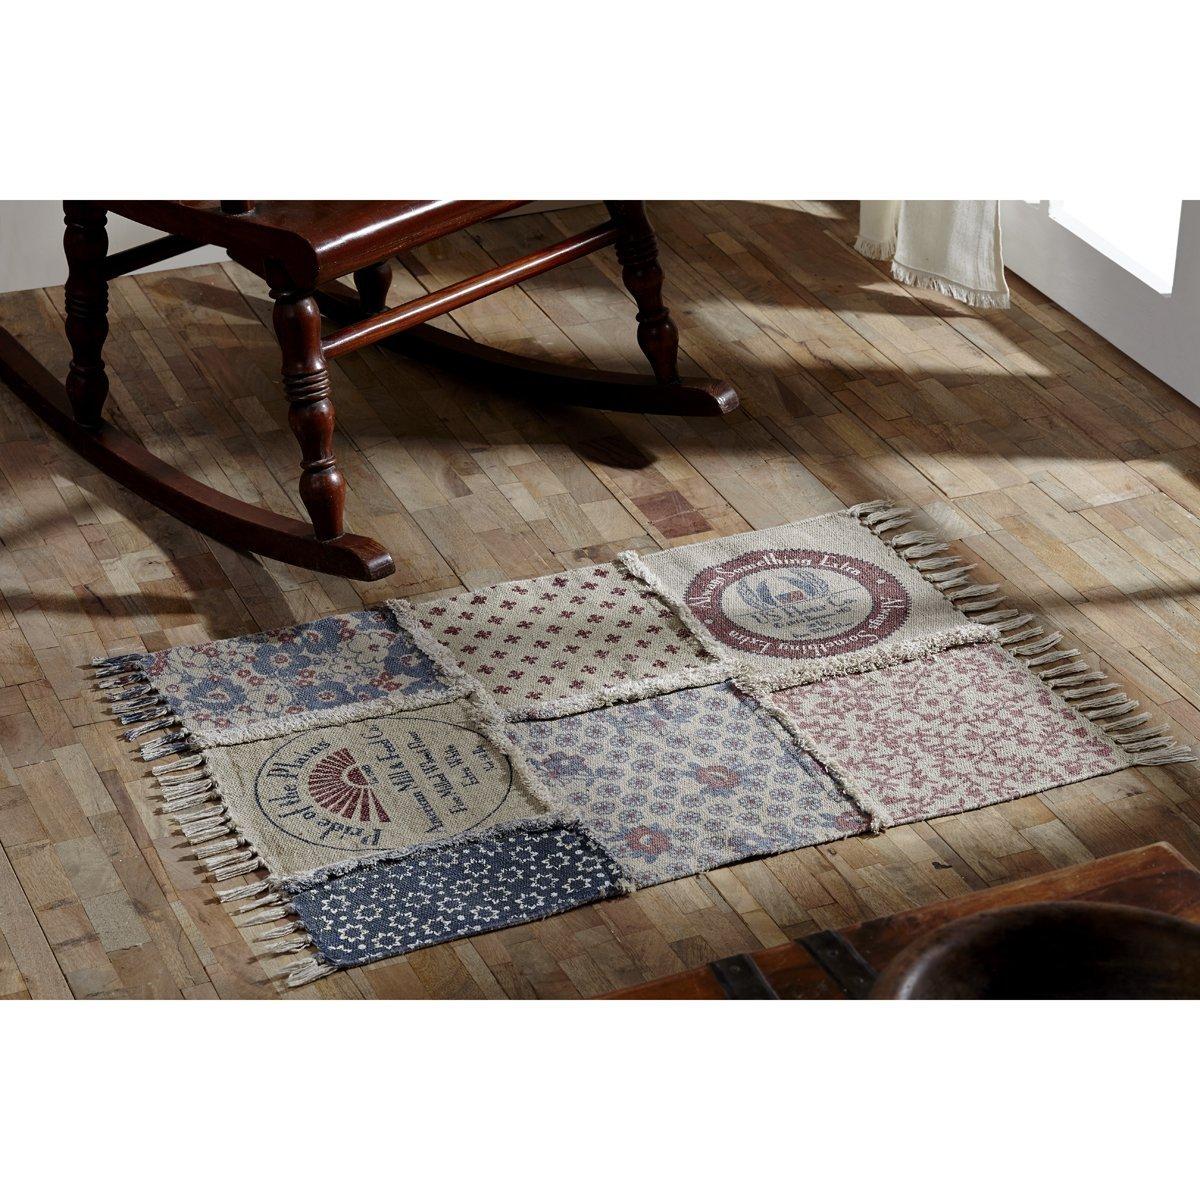 Millie White Patchwork Rug 5 x 8 5/' x 8/' 16147 VHC Brands Farmhouse Flooring